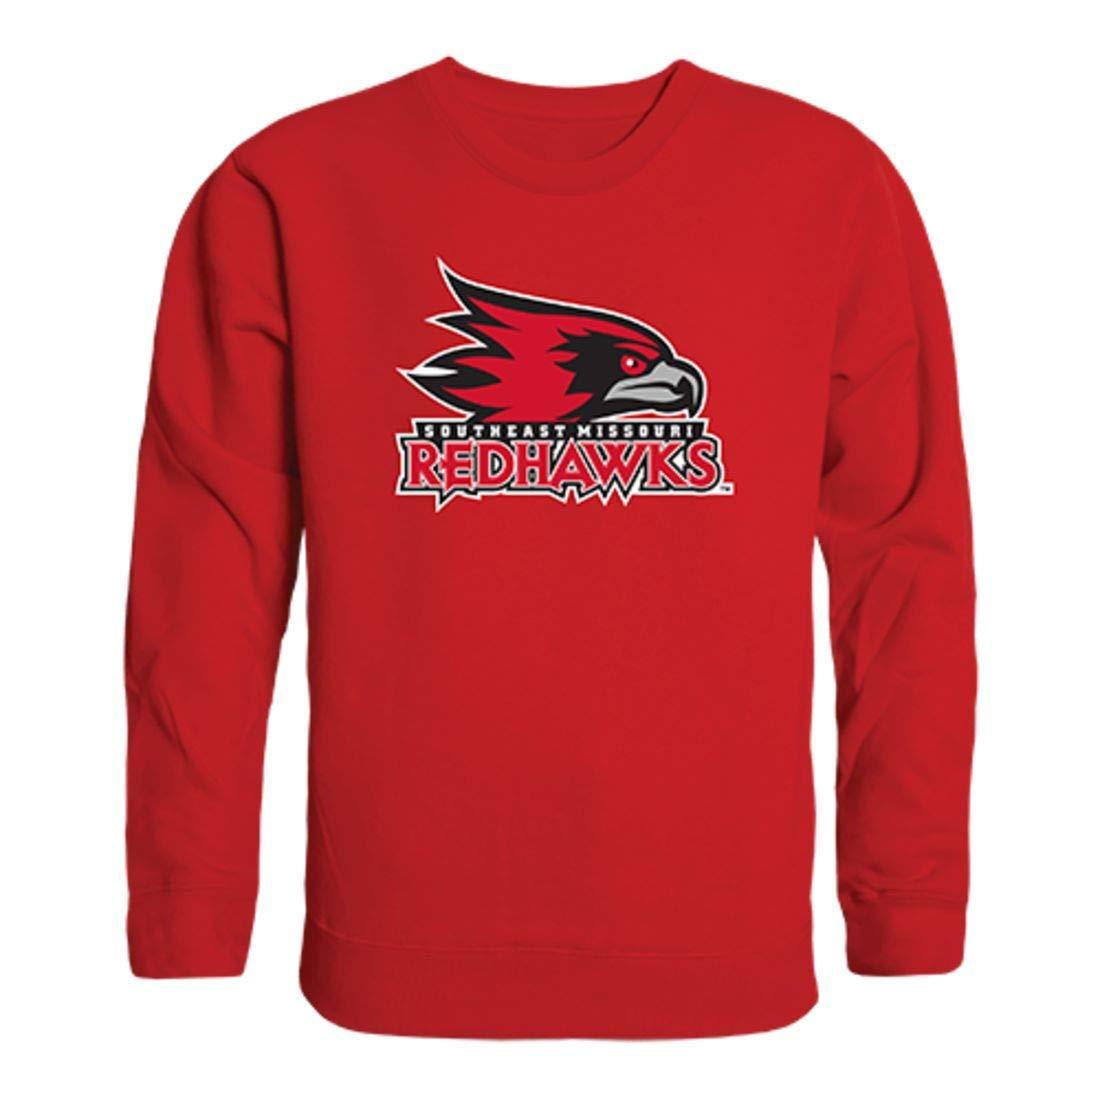 Southeast Missouri State University Redhawks Crewneck Pullover Sweatshirt Sweater Red